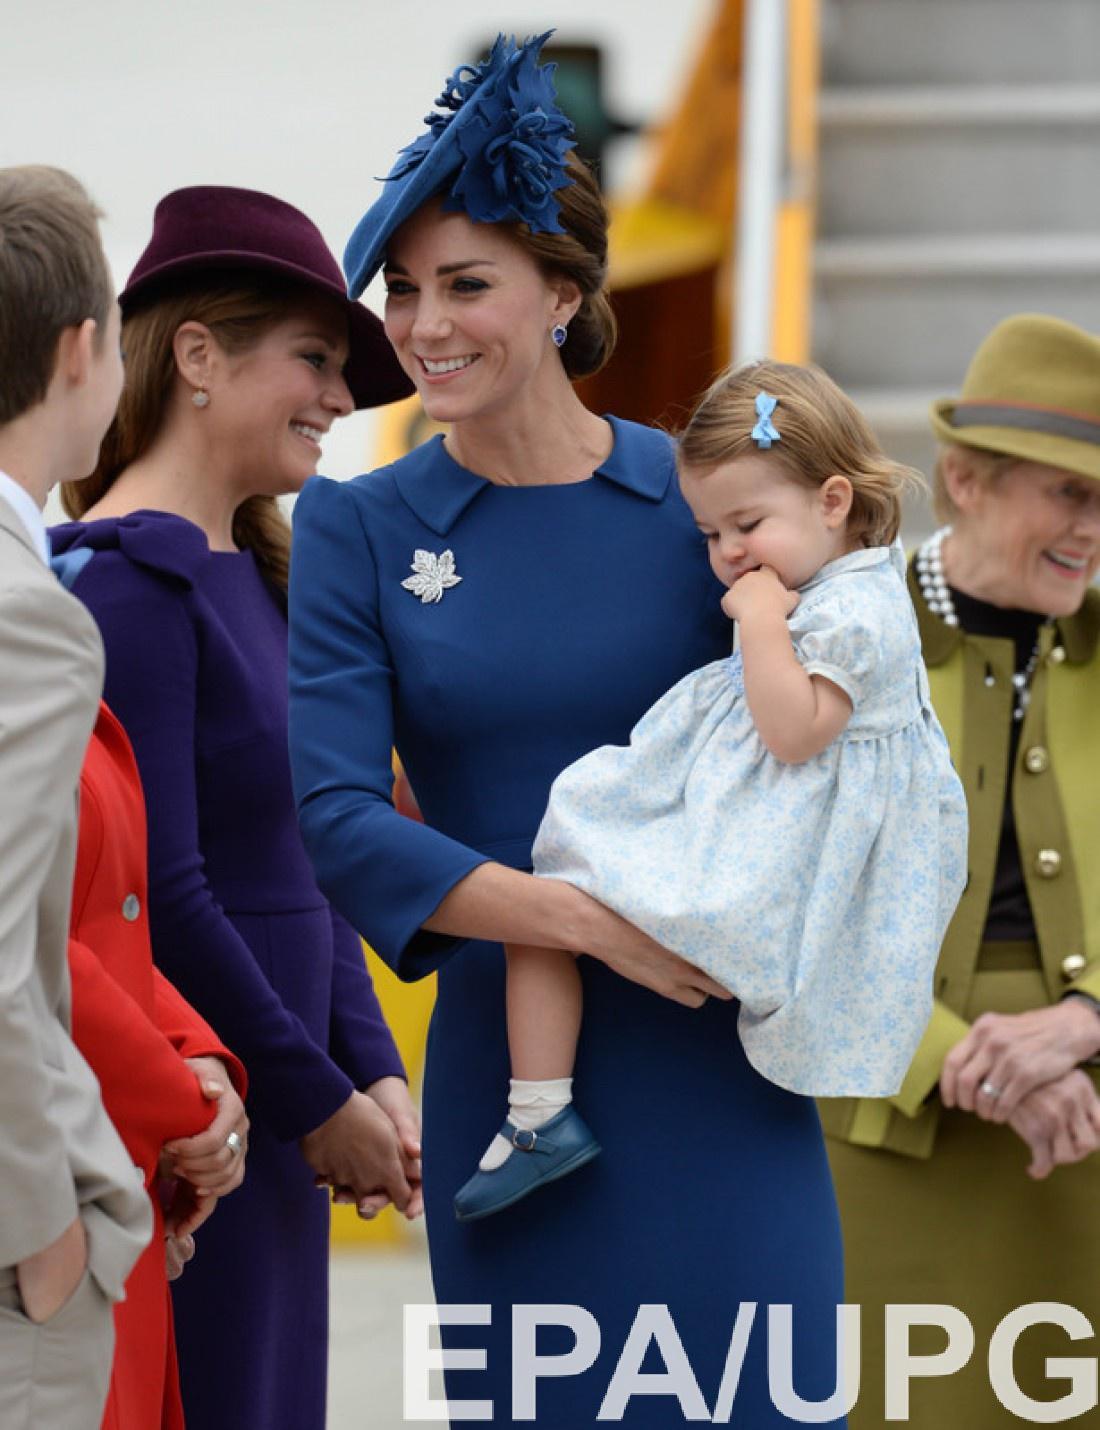 Принц Гарри познакомил Меган Маркл сКейт Миддлтон ипринцессой Шарлоттой